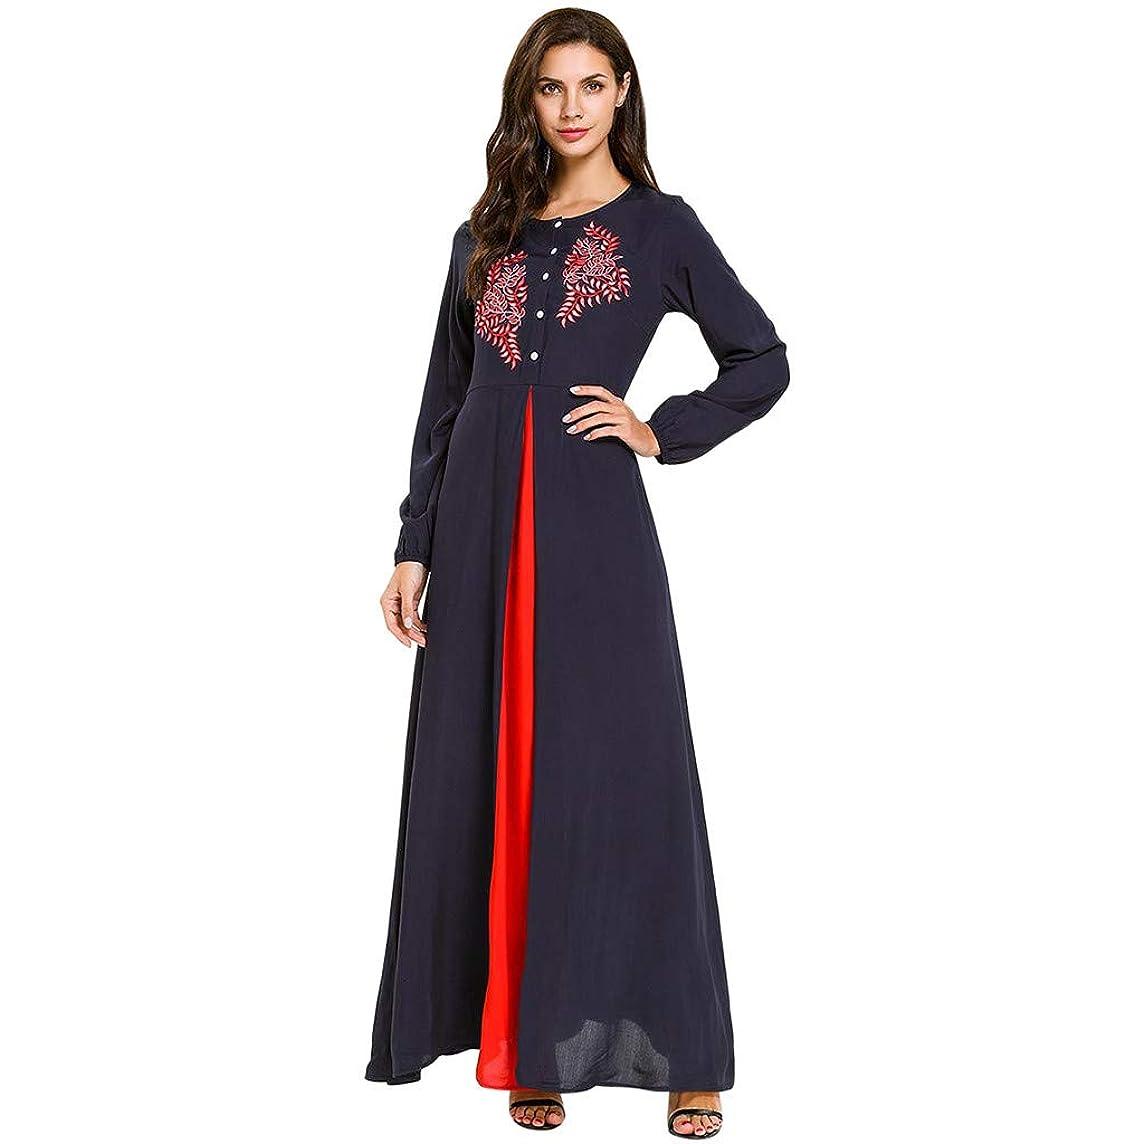 Muslim Dress for Women Robe Open Abaya Long Sleeve Arabic Long Dress Islamic Muslim Middle Eastern Clothing CapsA